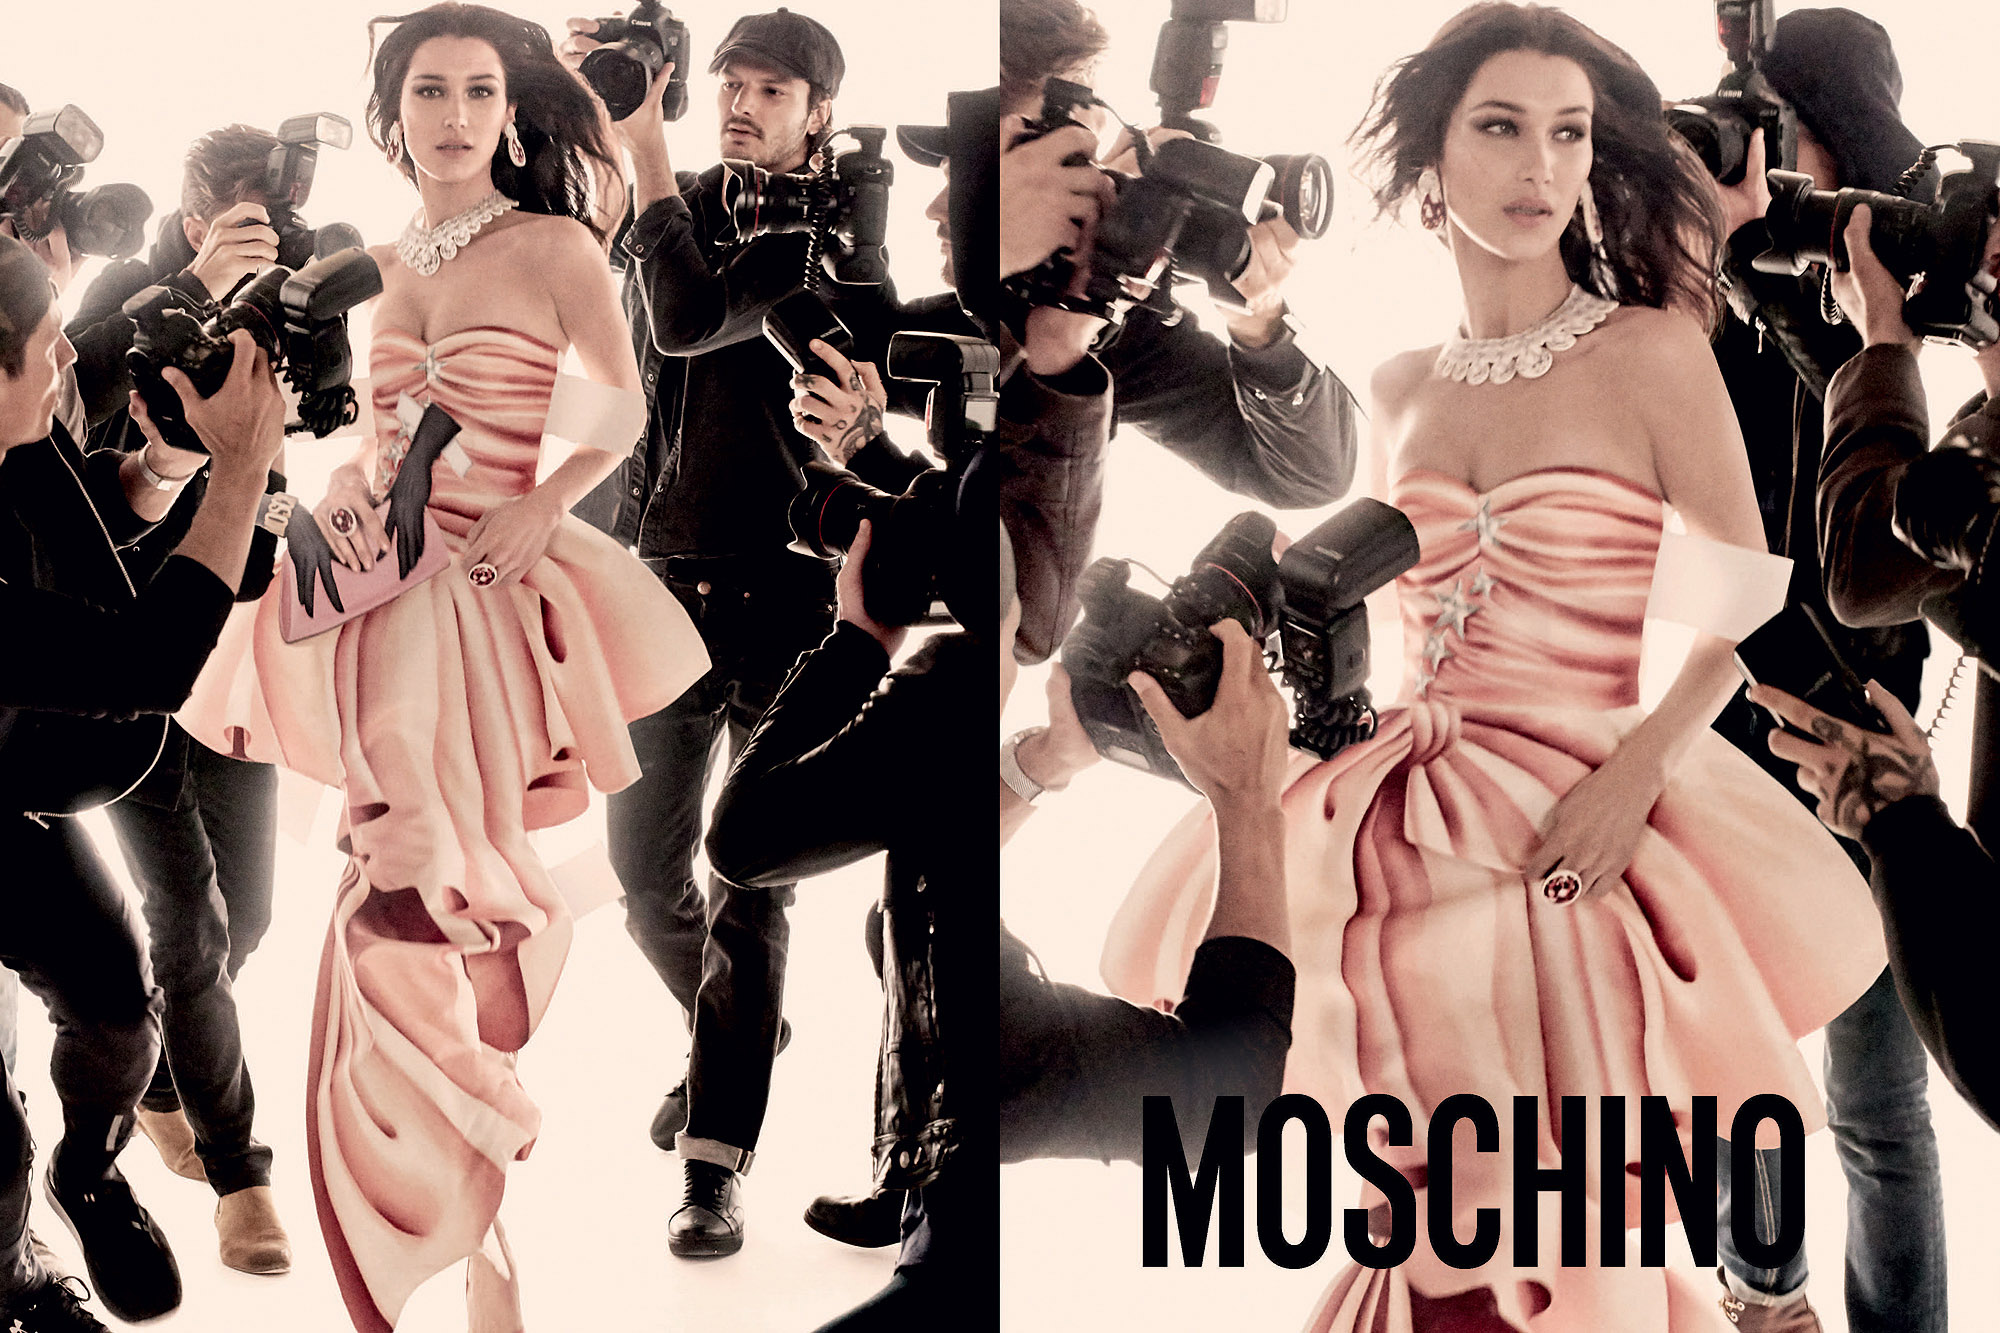 moschino-2-48322402f47af7e15d2b1f813b285147.jpg